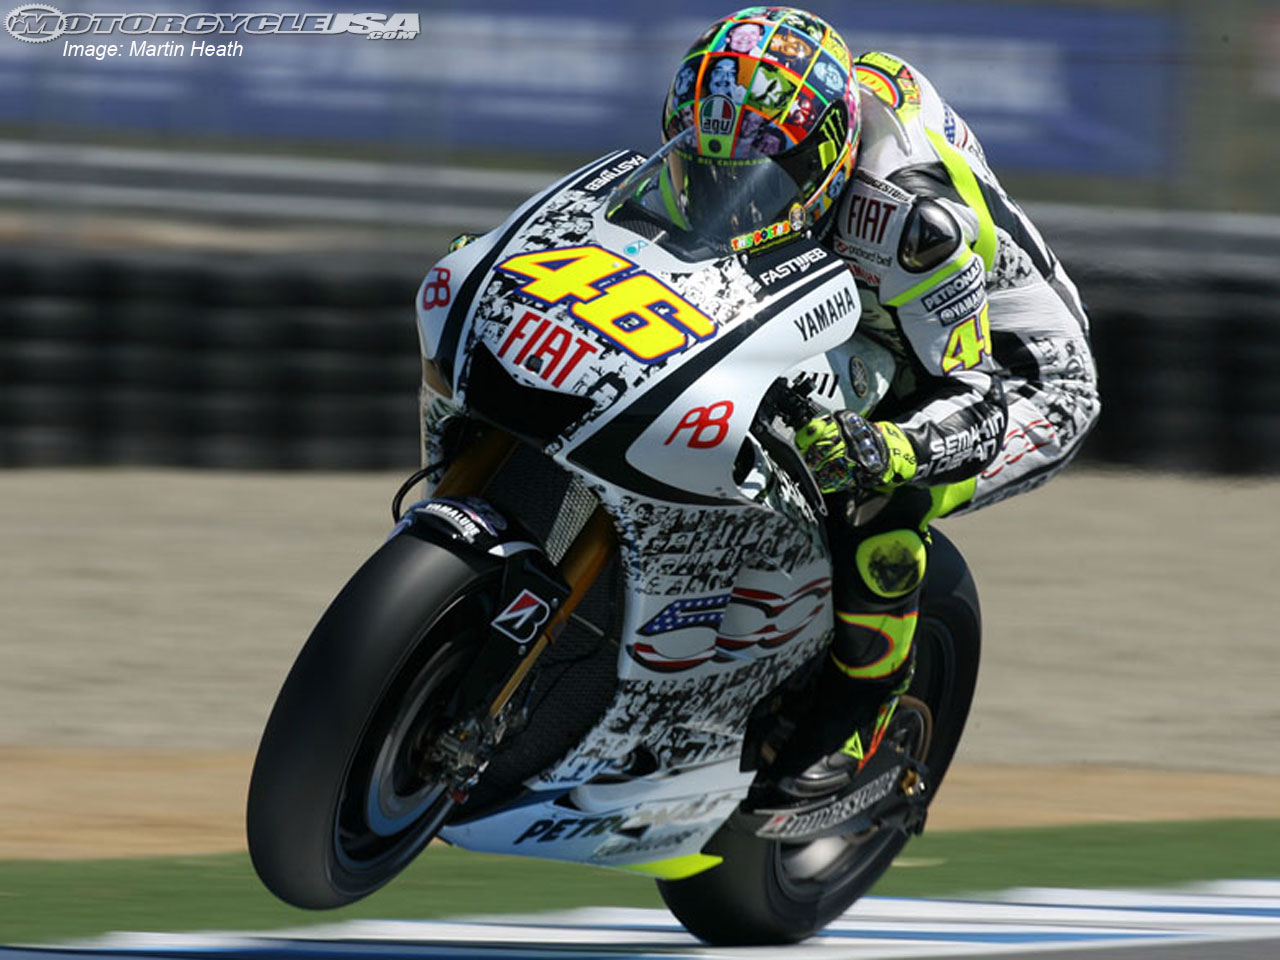 Download High quality MotoGP Wallpaper Num 23 1280 x 960 1913 1280x960